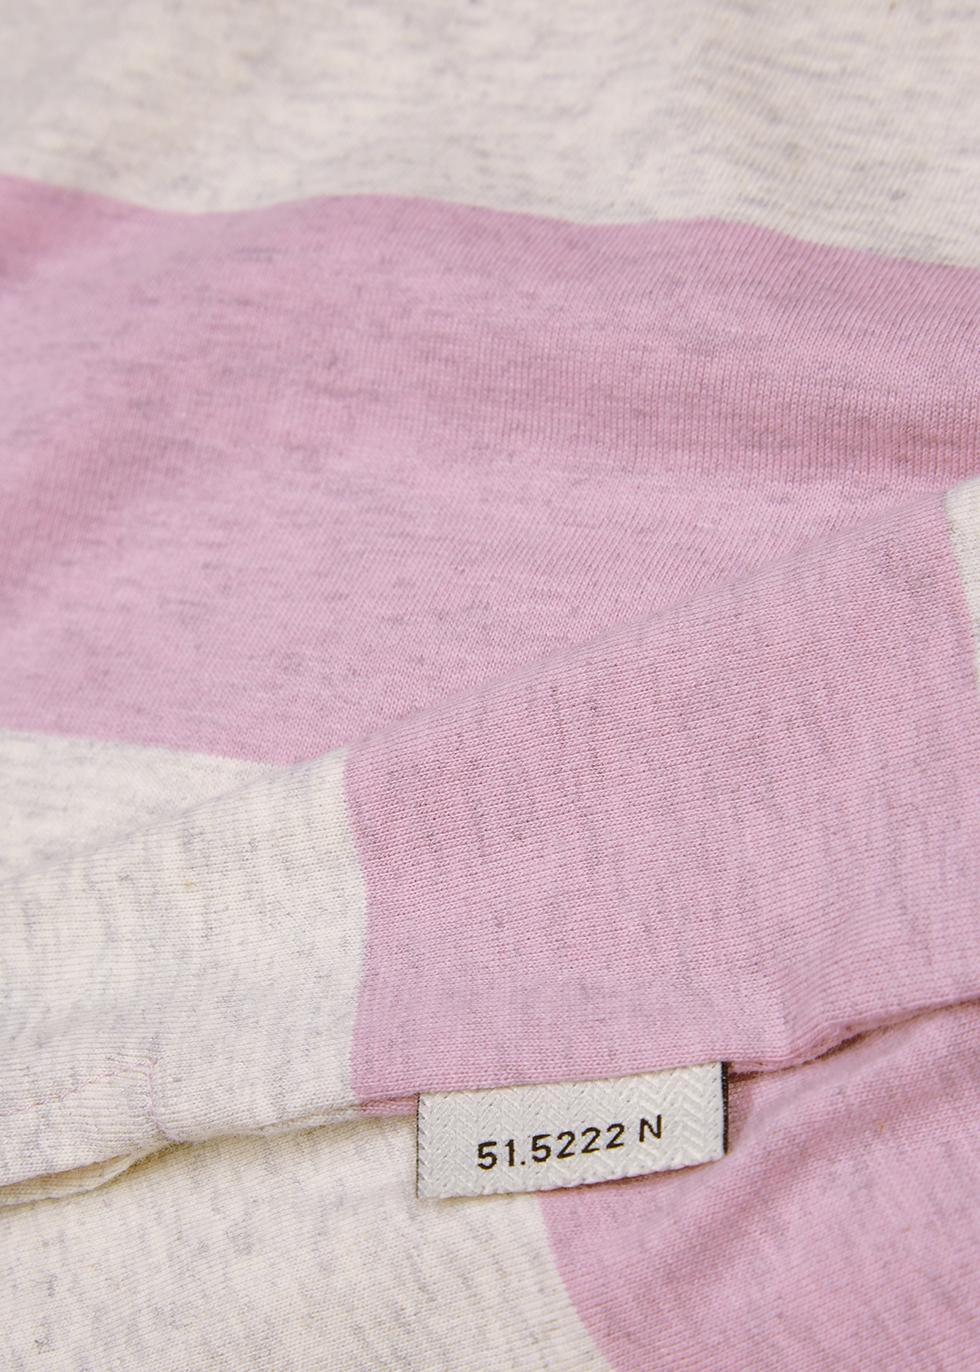 Striped cotton T-shirt - Oliver Spencer